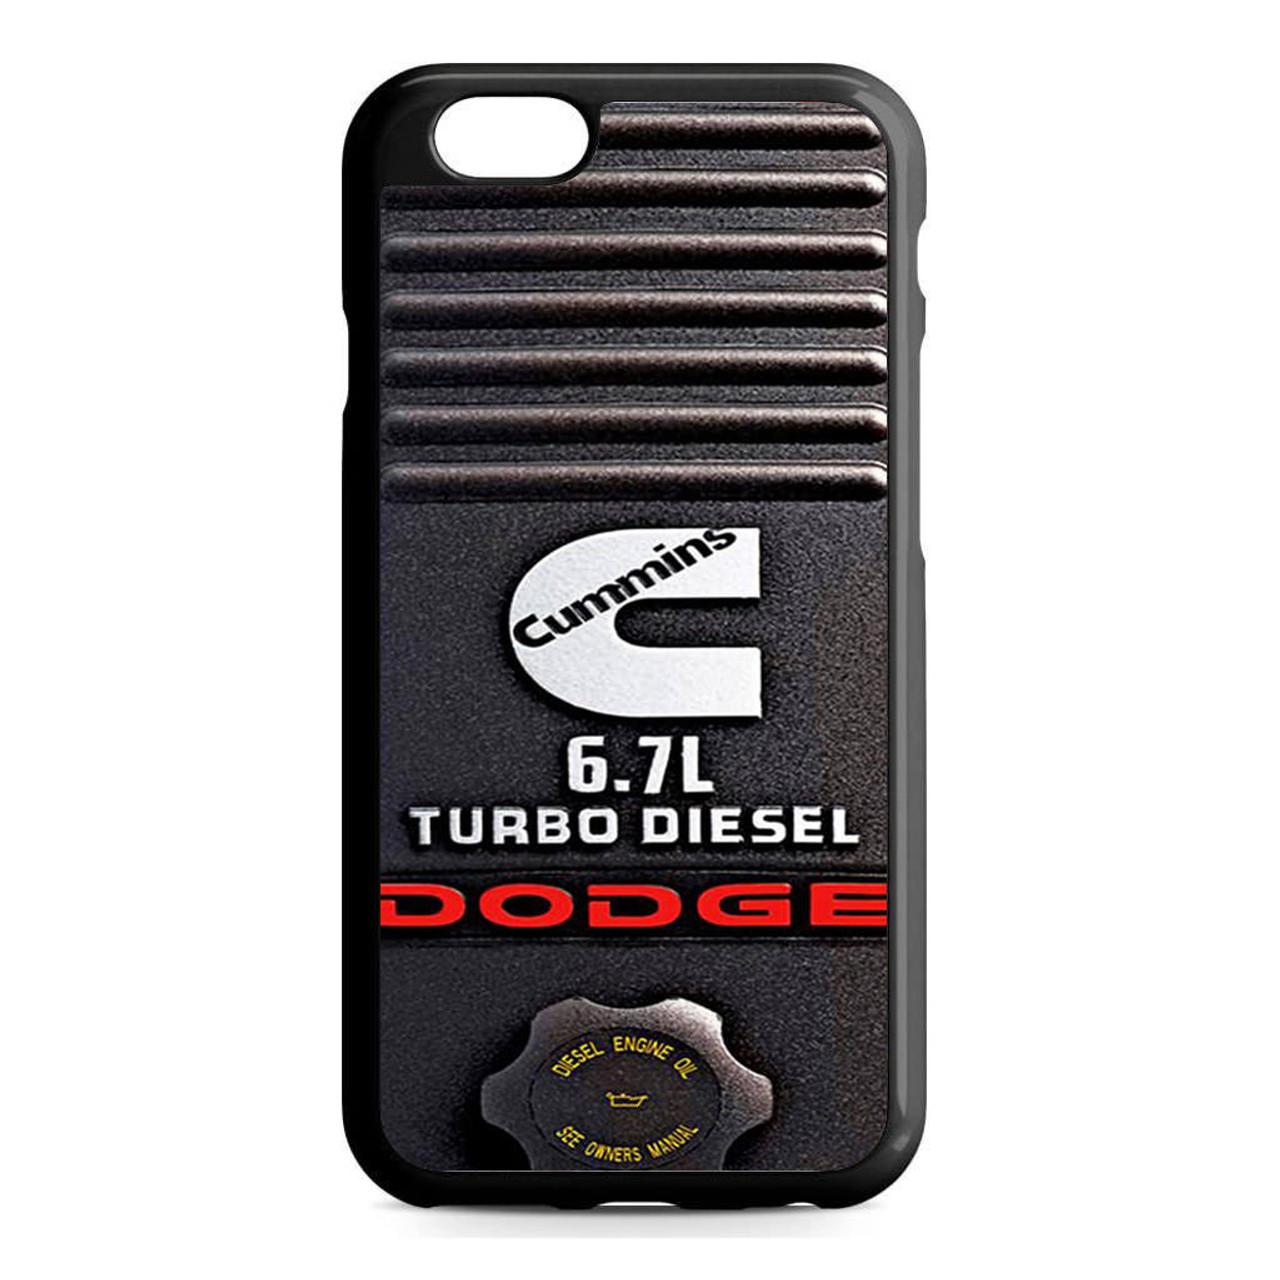 Cummins Turbo Diesel >> Dodge Cummins Turbo Diesel Iphone 6 6s Case Caseshunter